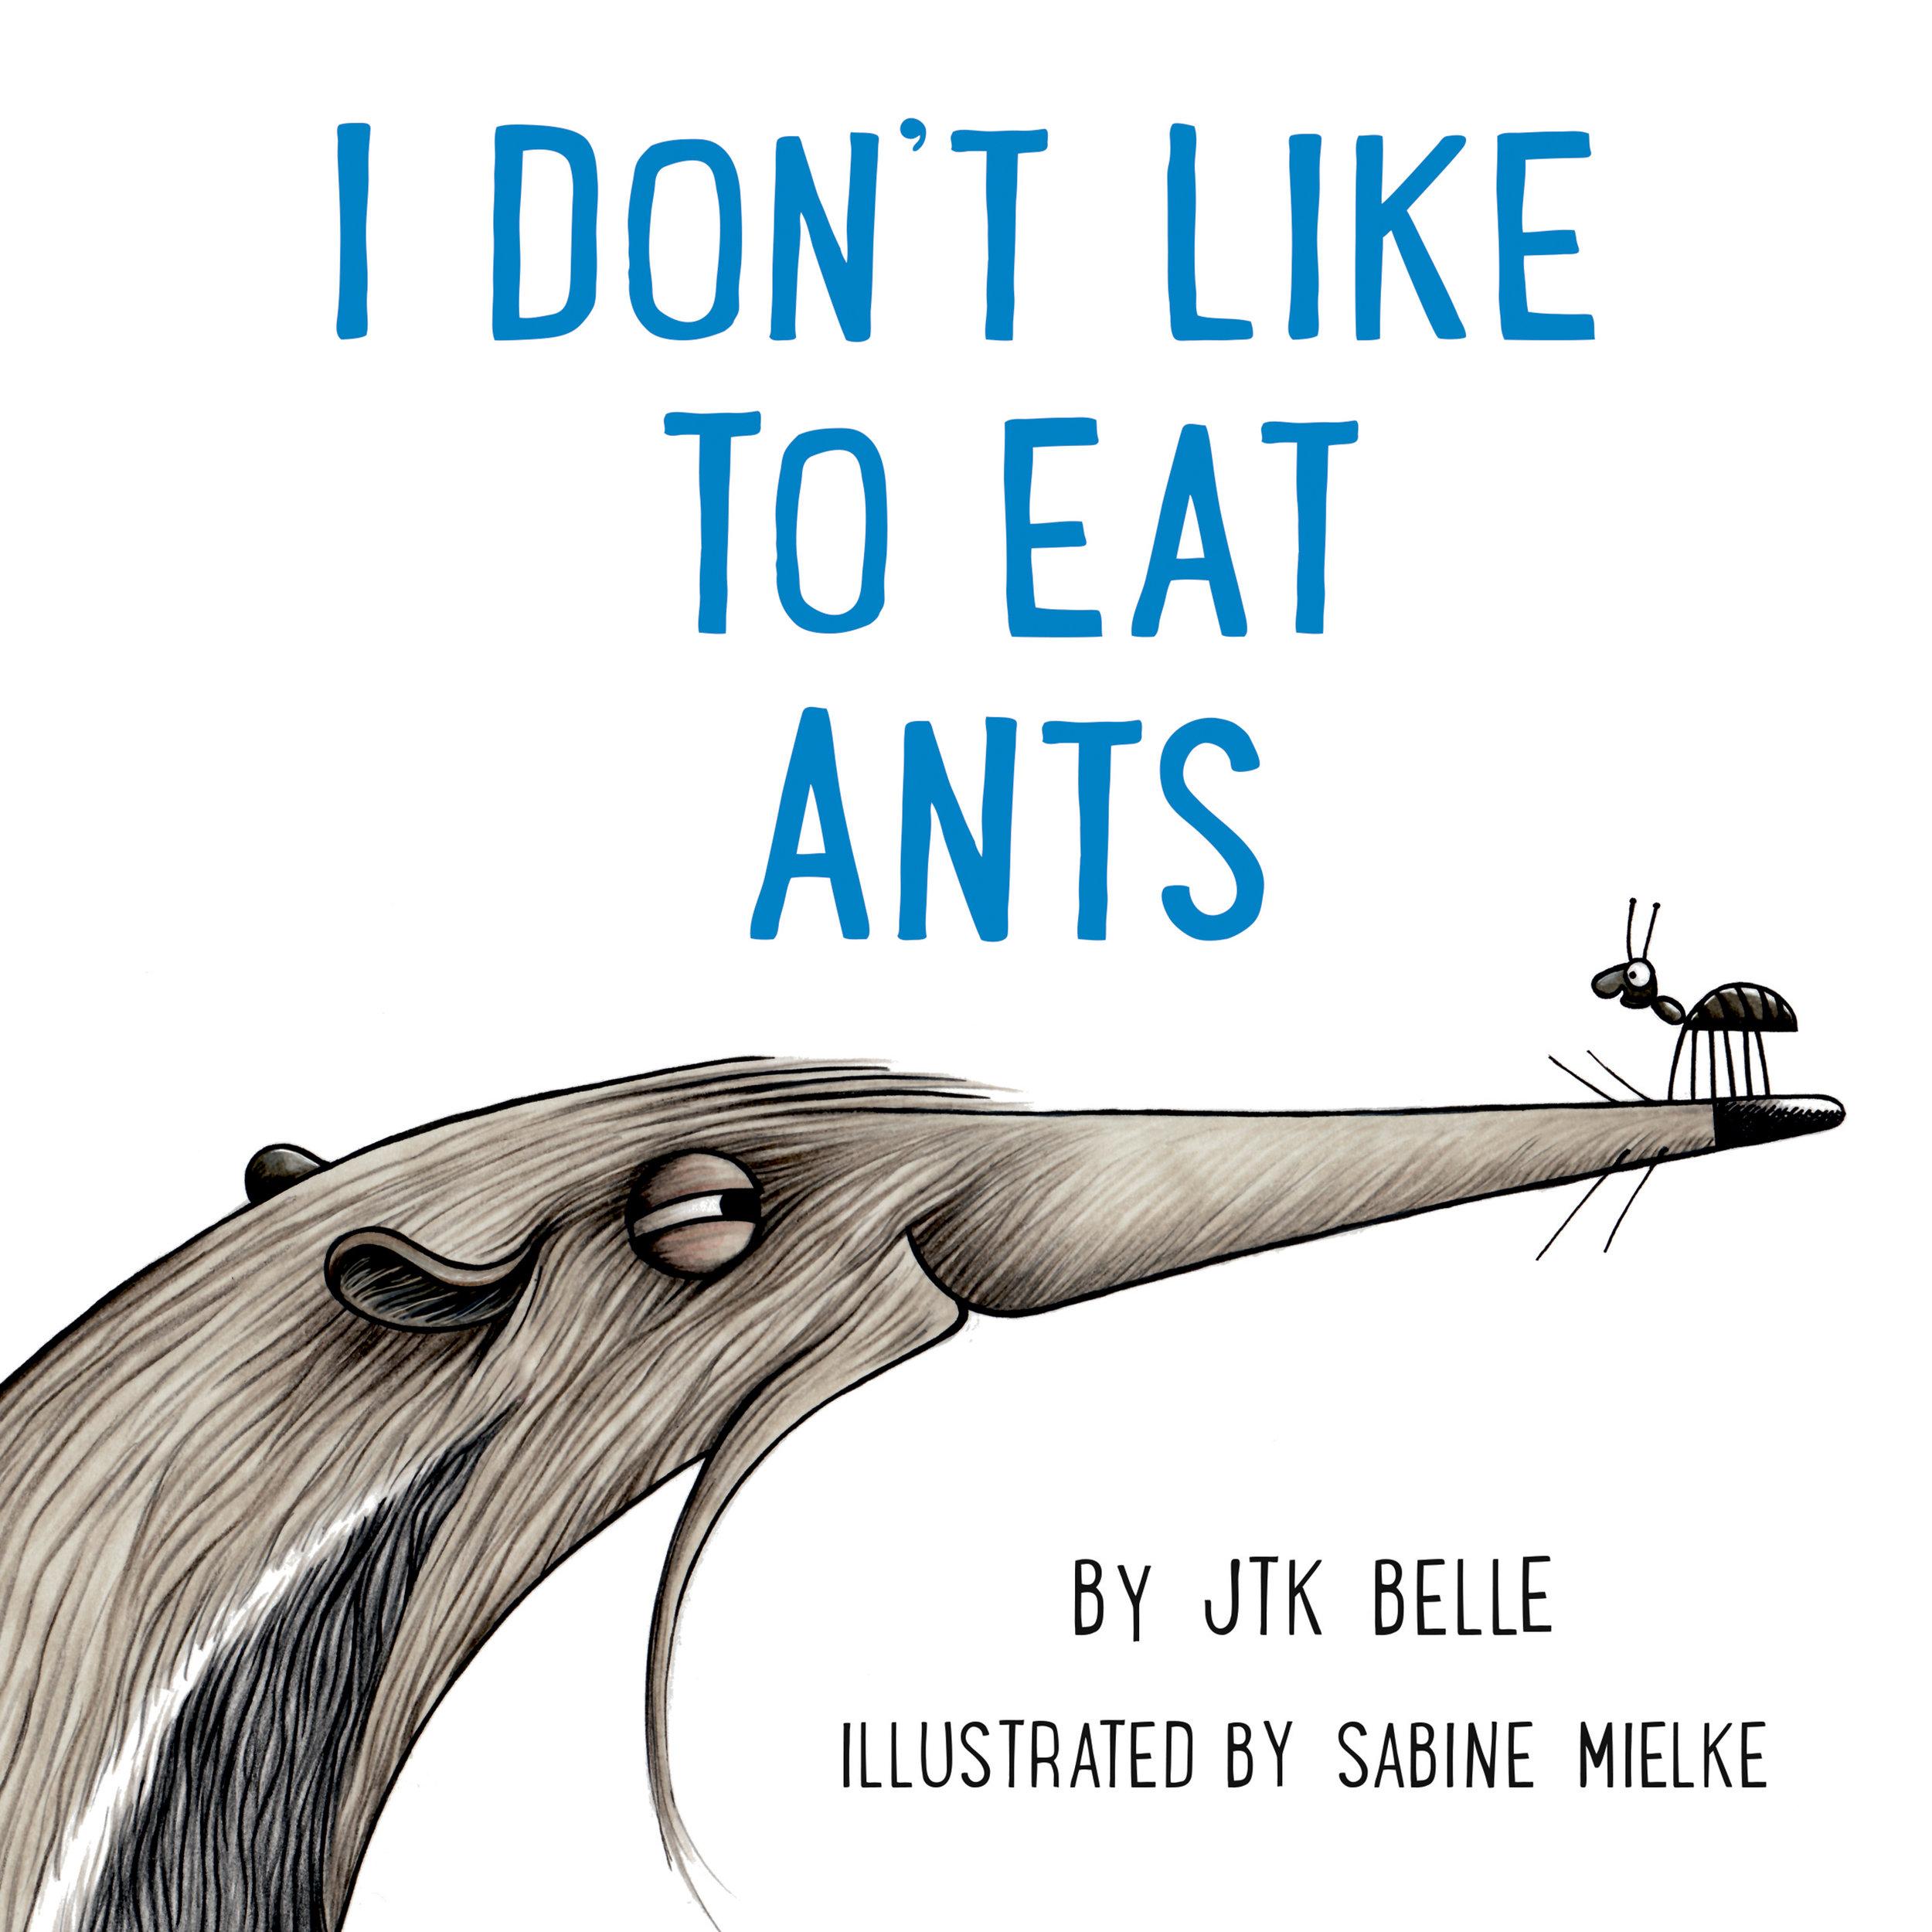 Belle_I don't like to eat ants_cover Ebook.jpg